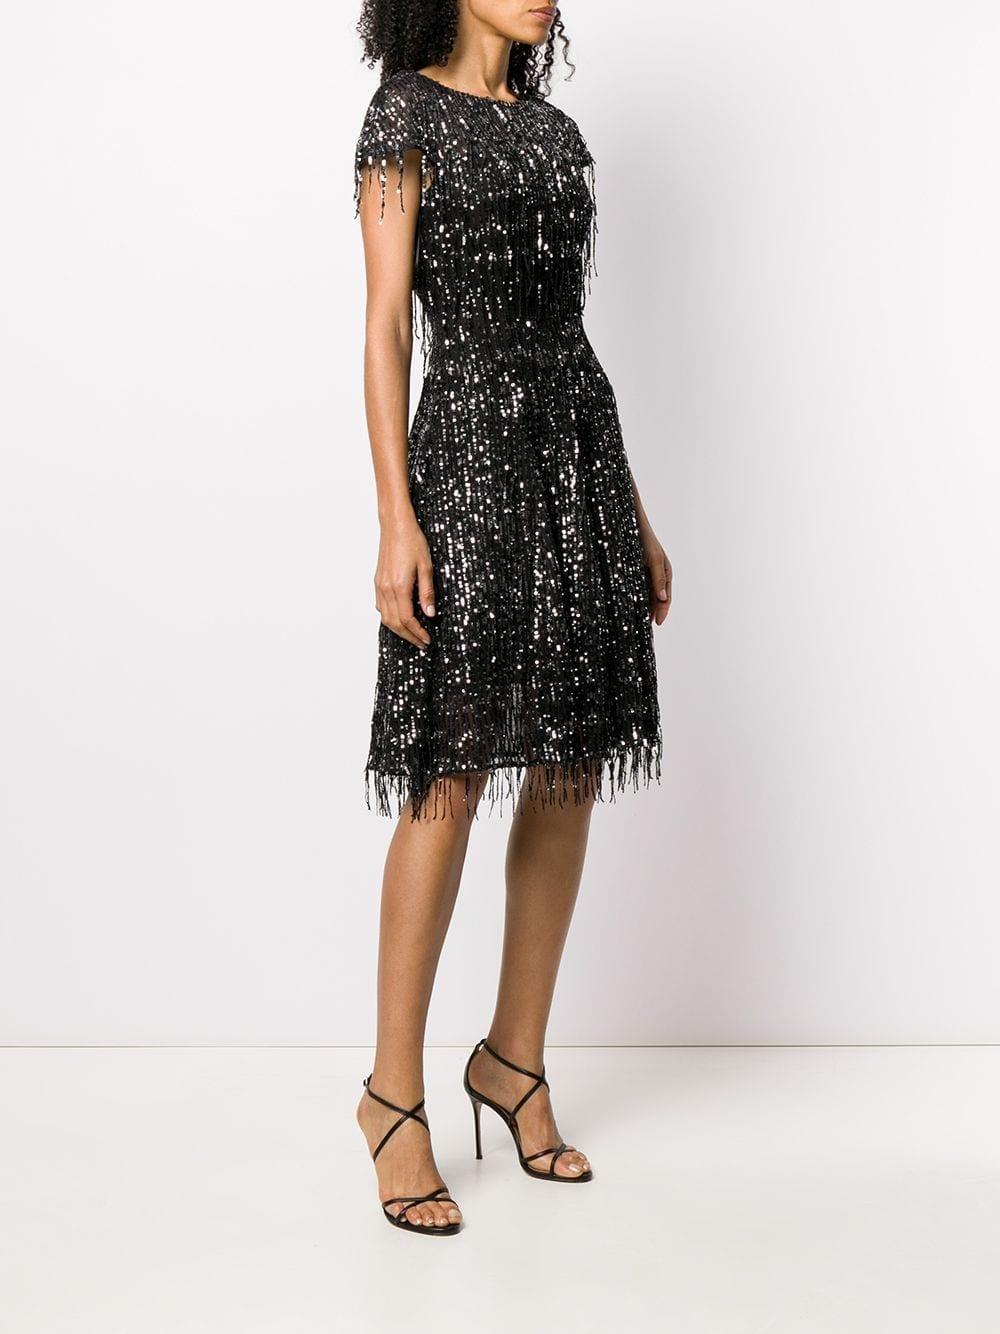 TALBOT RUNHOF Froufrou Sequin-embellished Dress